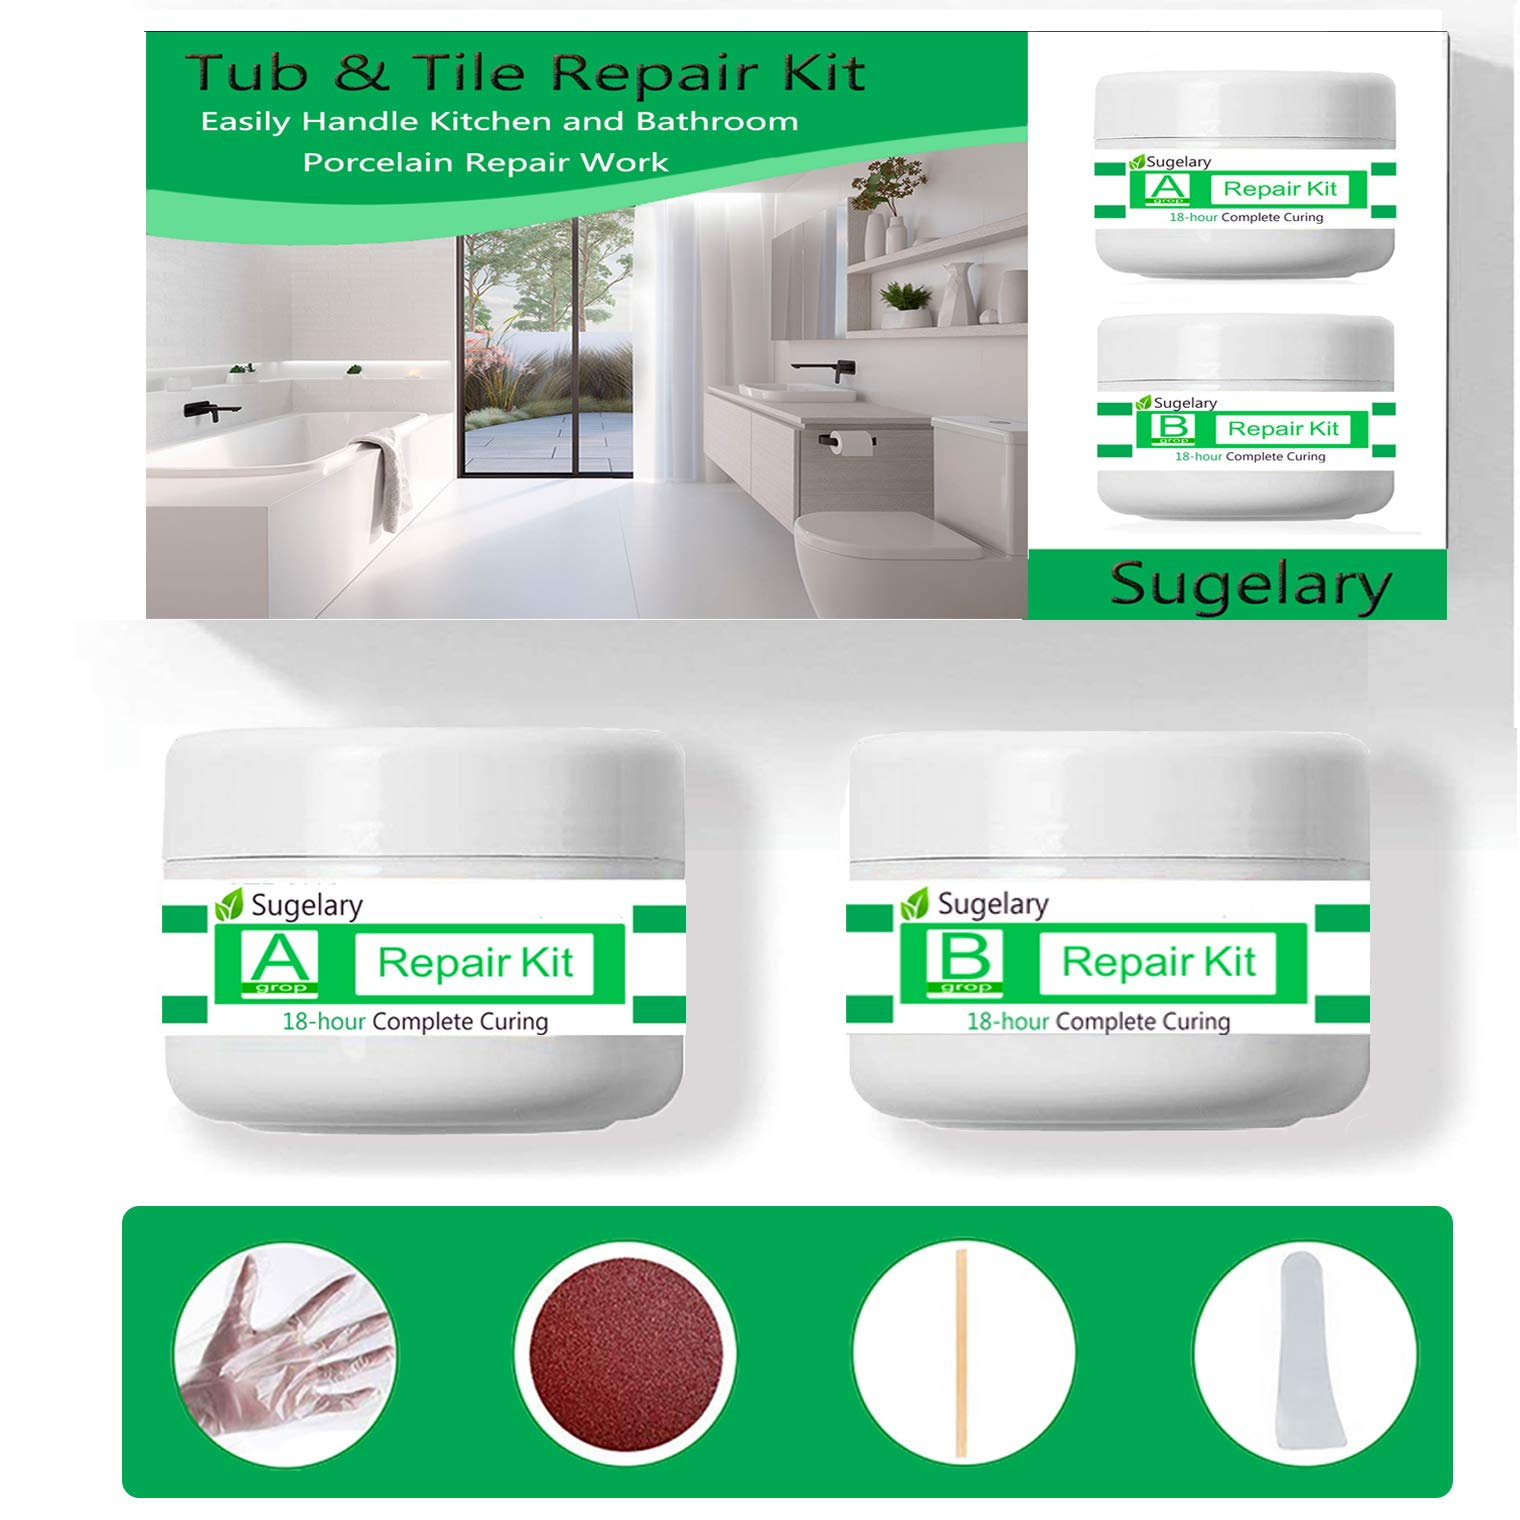 Porcelain Repair Kit, Fiberglass Tub Repair Kit for Shower White Tubs, Tile Ceramic Toilet Stone Chips Scraps Drill Holes Repair, Tub and Tile Refinishing Kit Joint or Installation Adhesive (White)